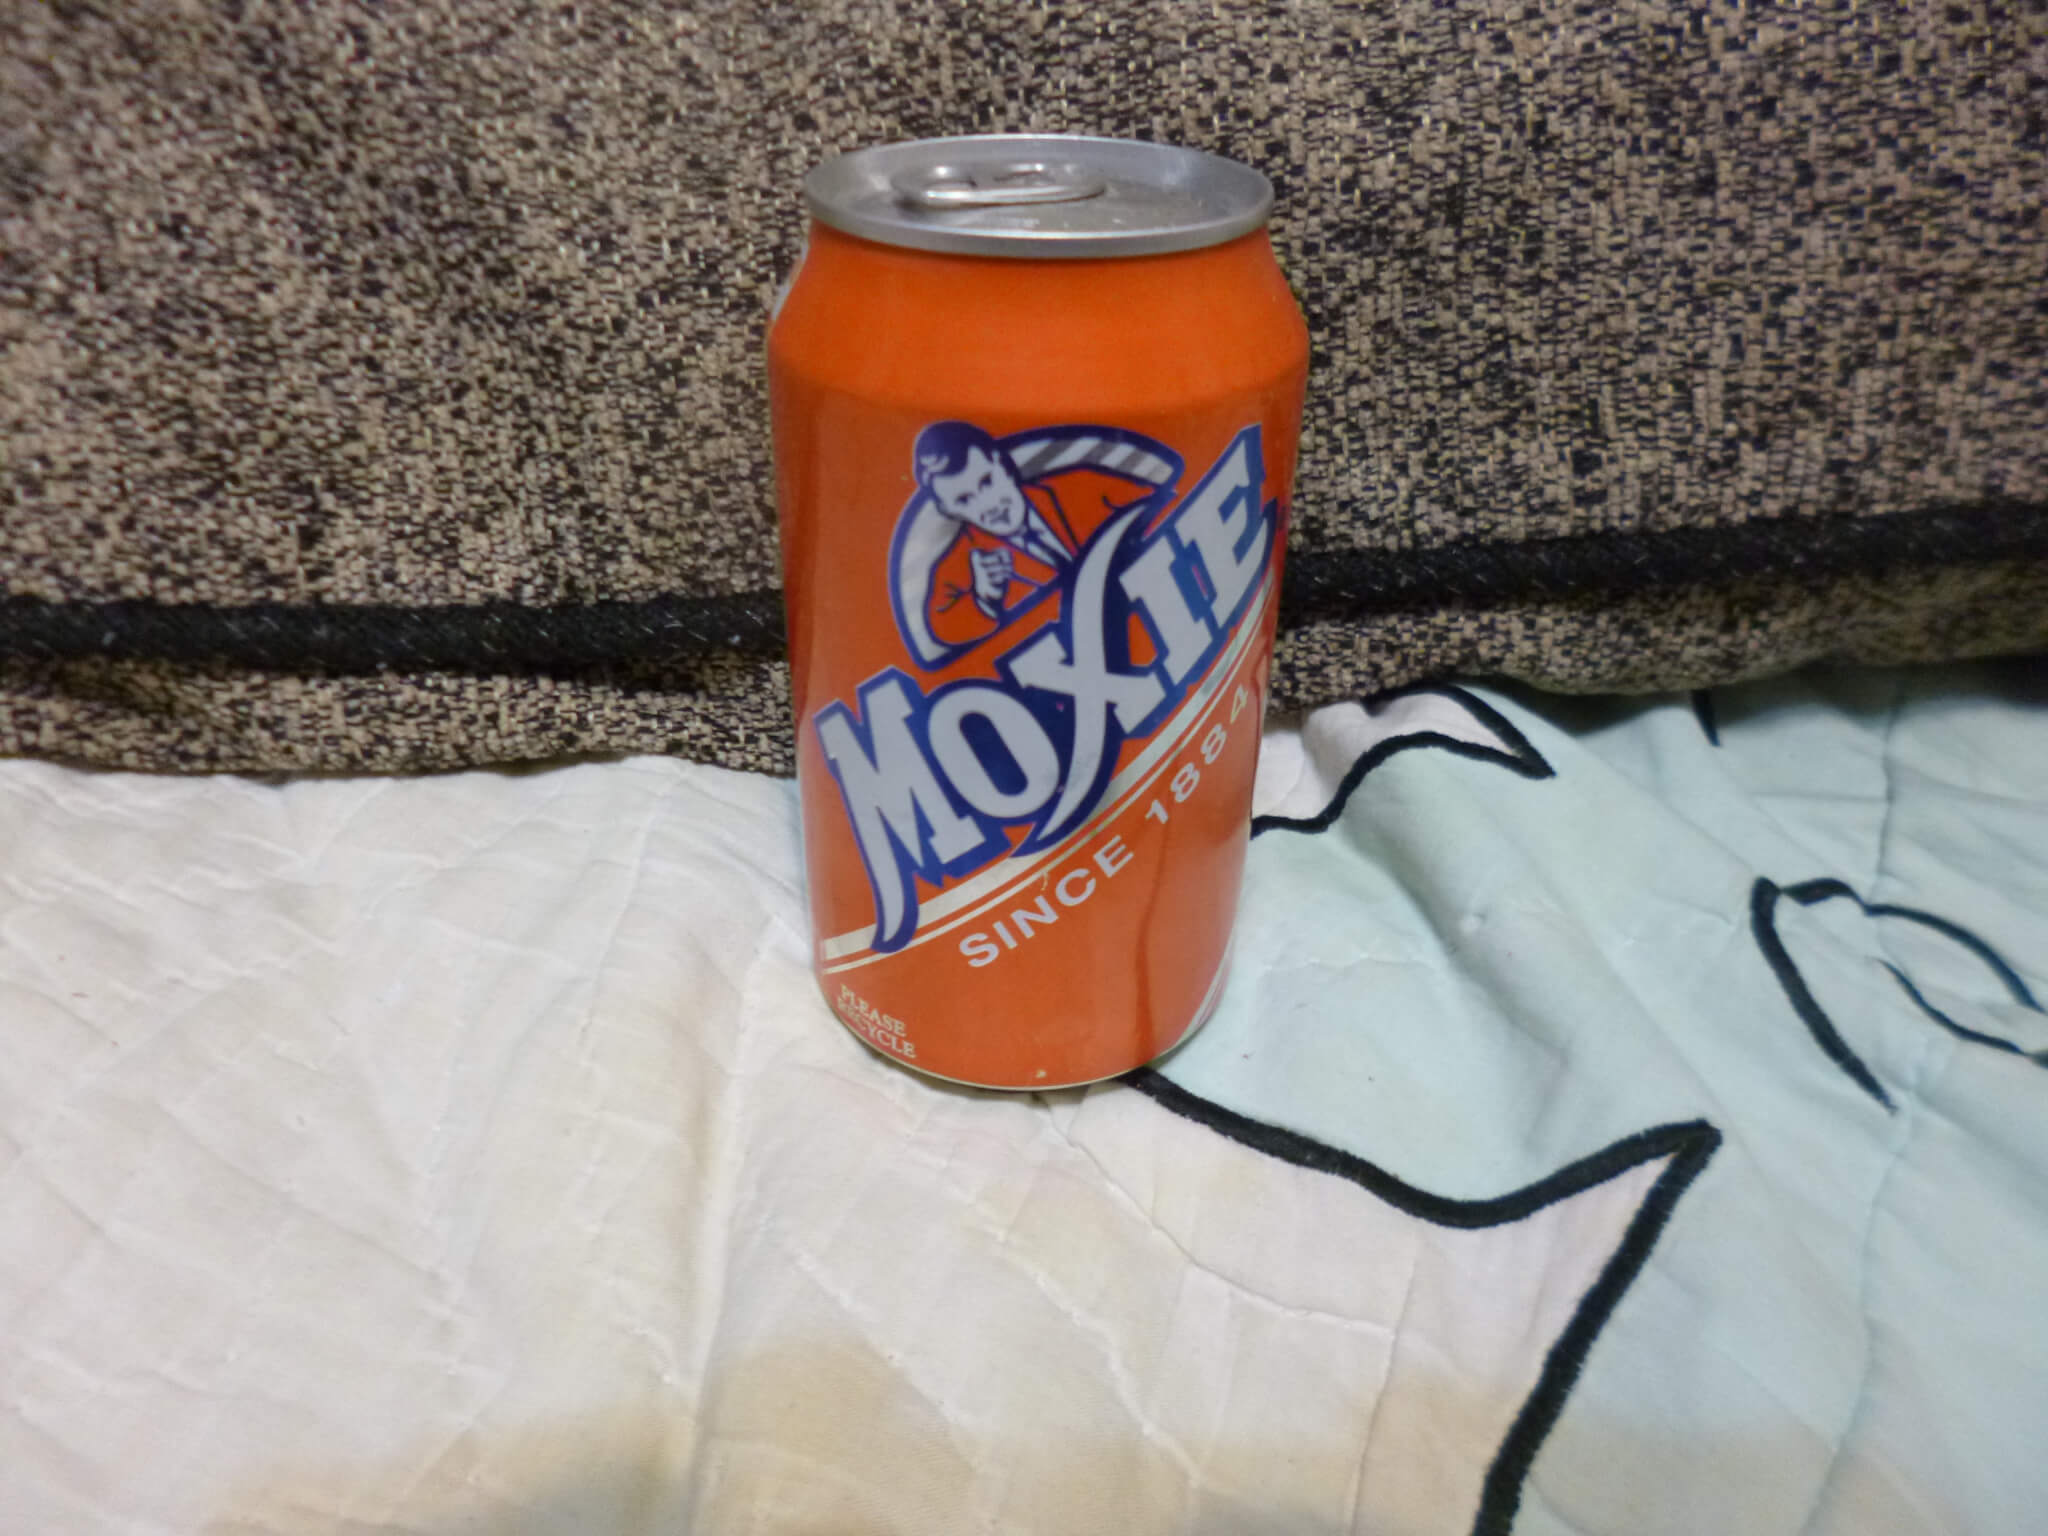 VINTAGE MOXIE FULL SODA CAN